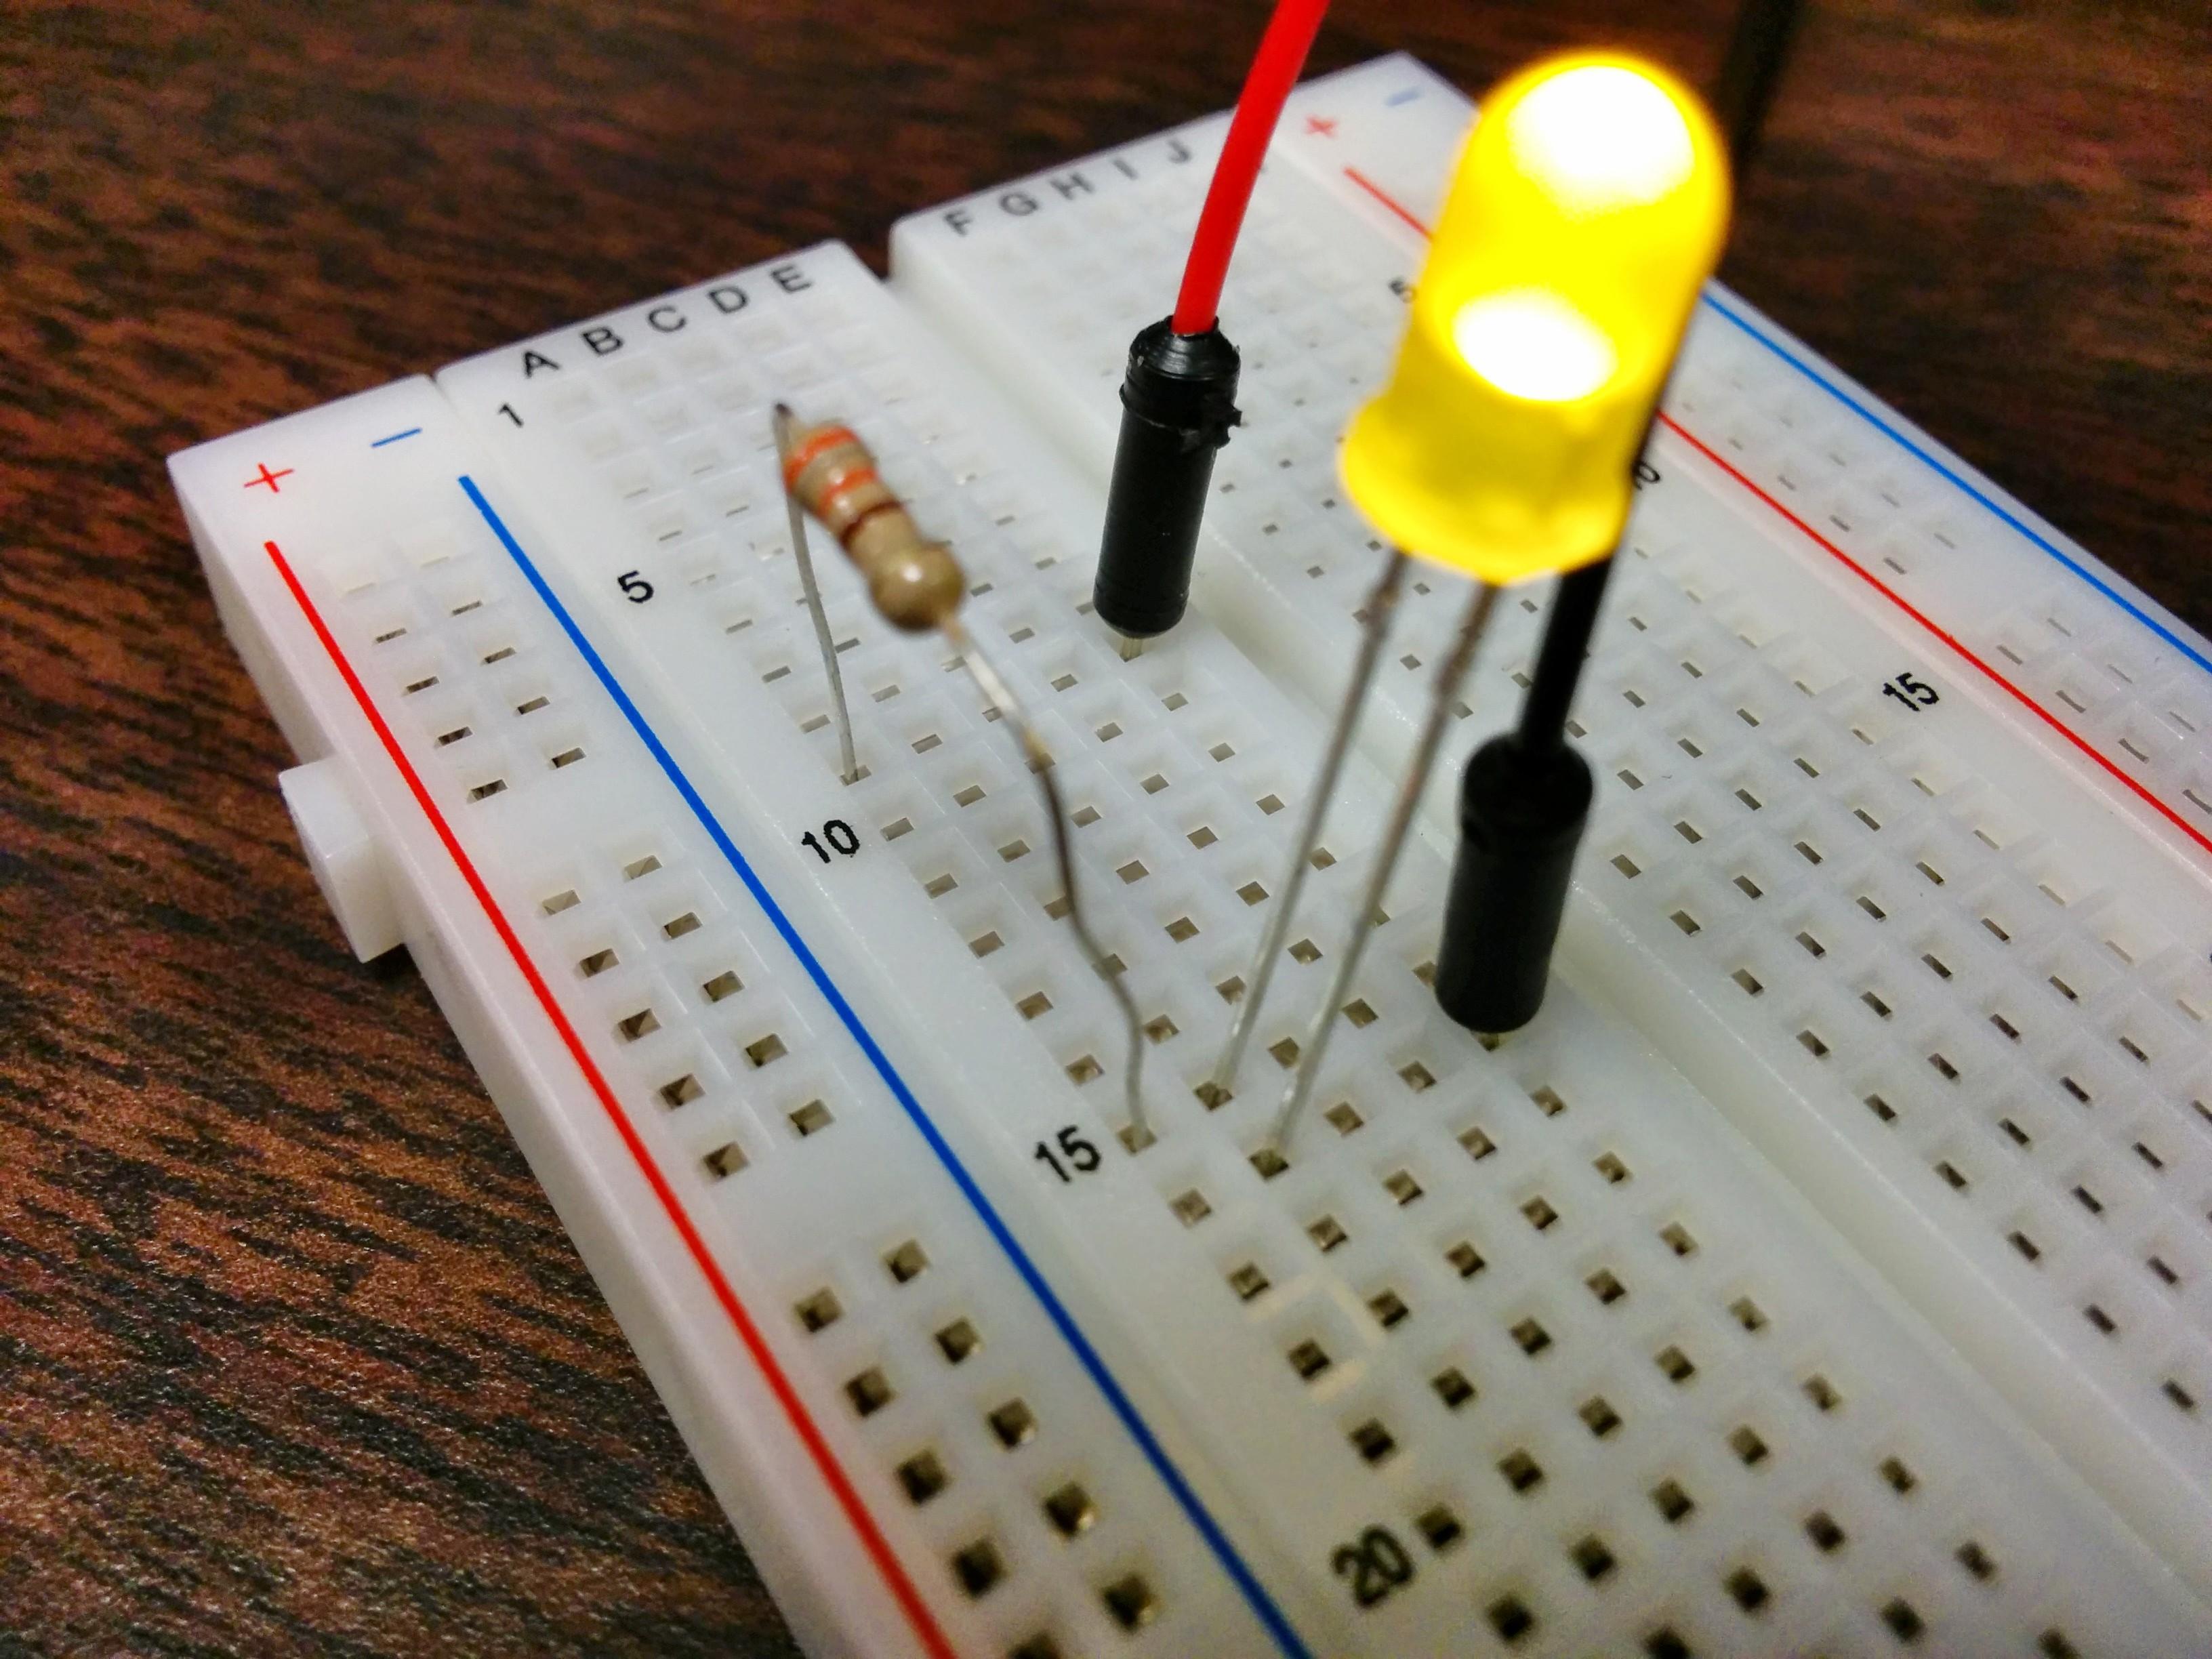 LED Blinky Breadboard Circuit